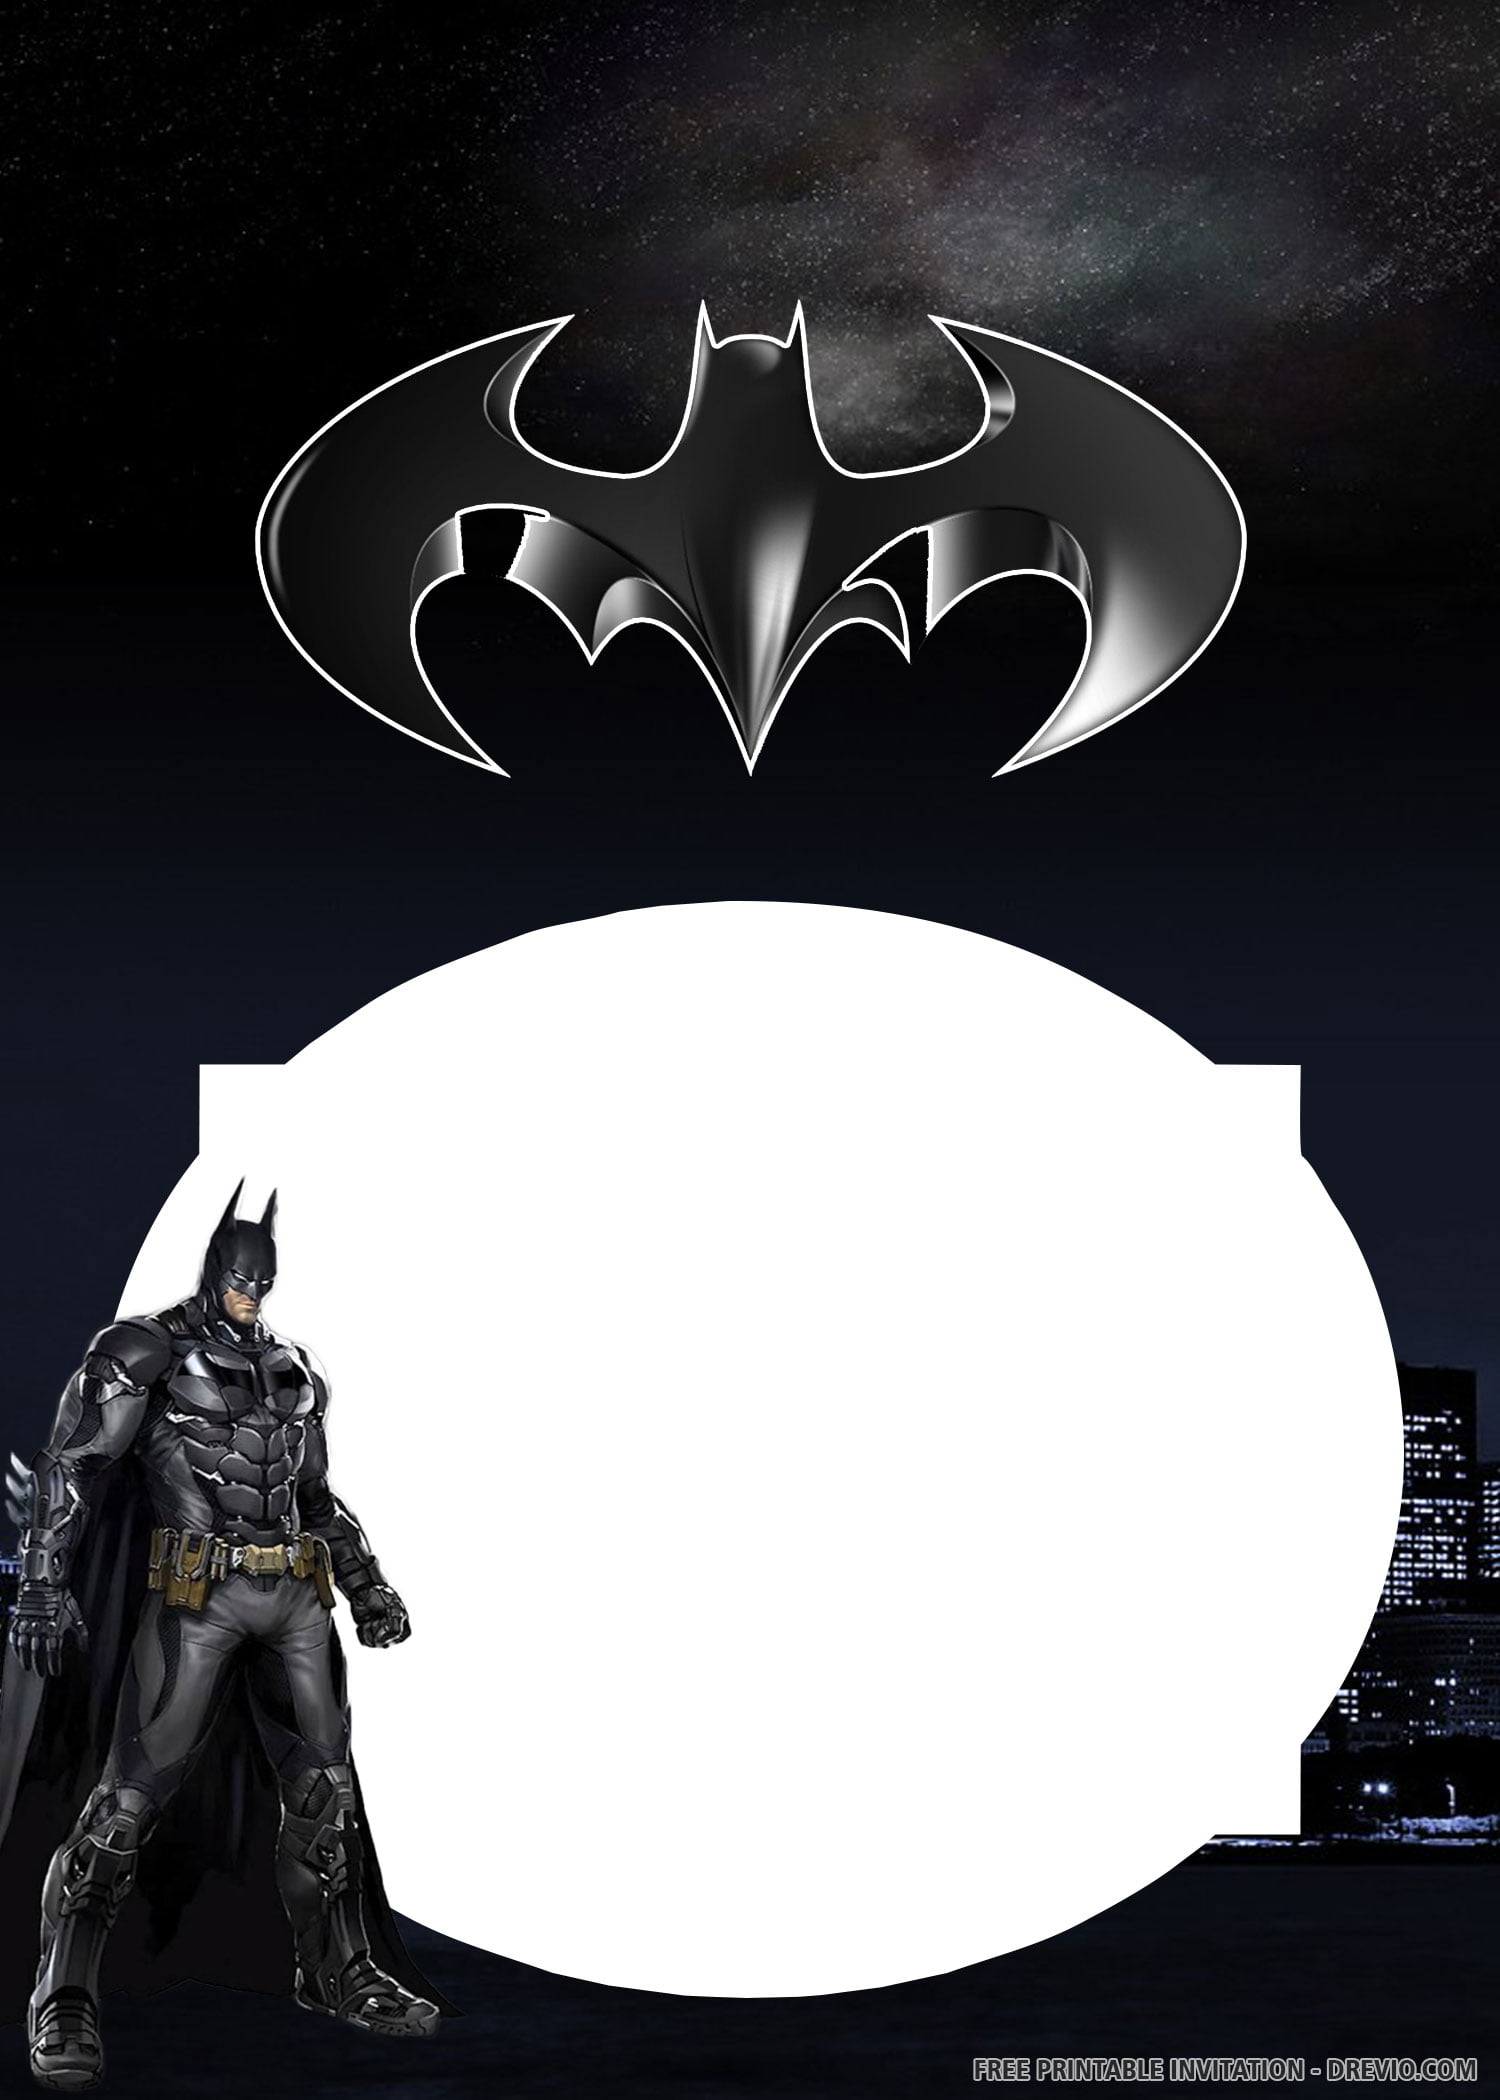 Free Printable Batman Invitation Templates Download Hundreds Free Printable Birthday Invitation Templates